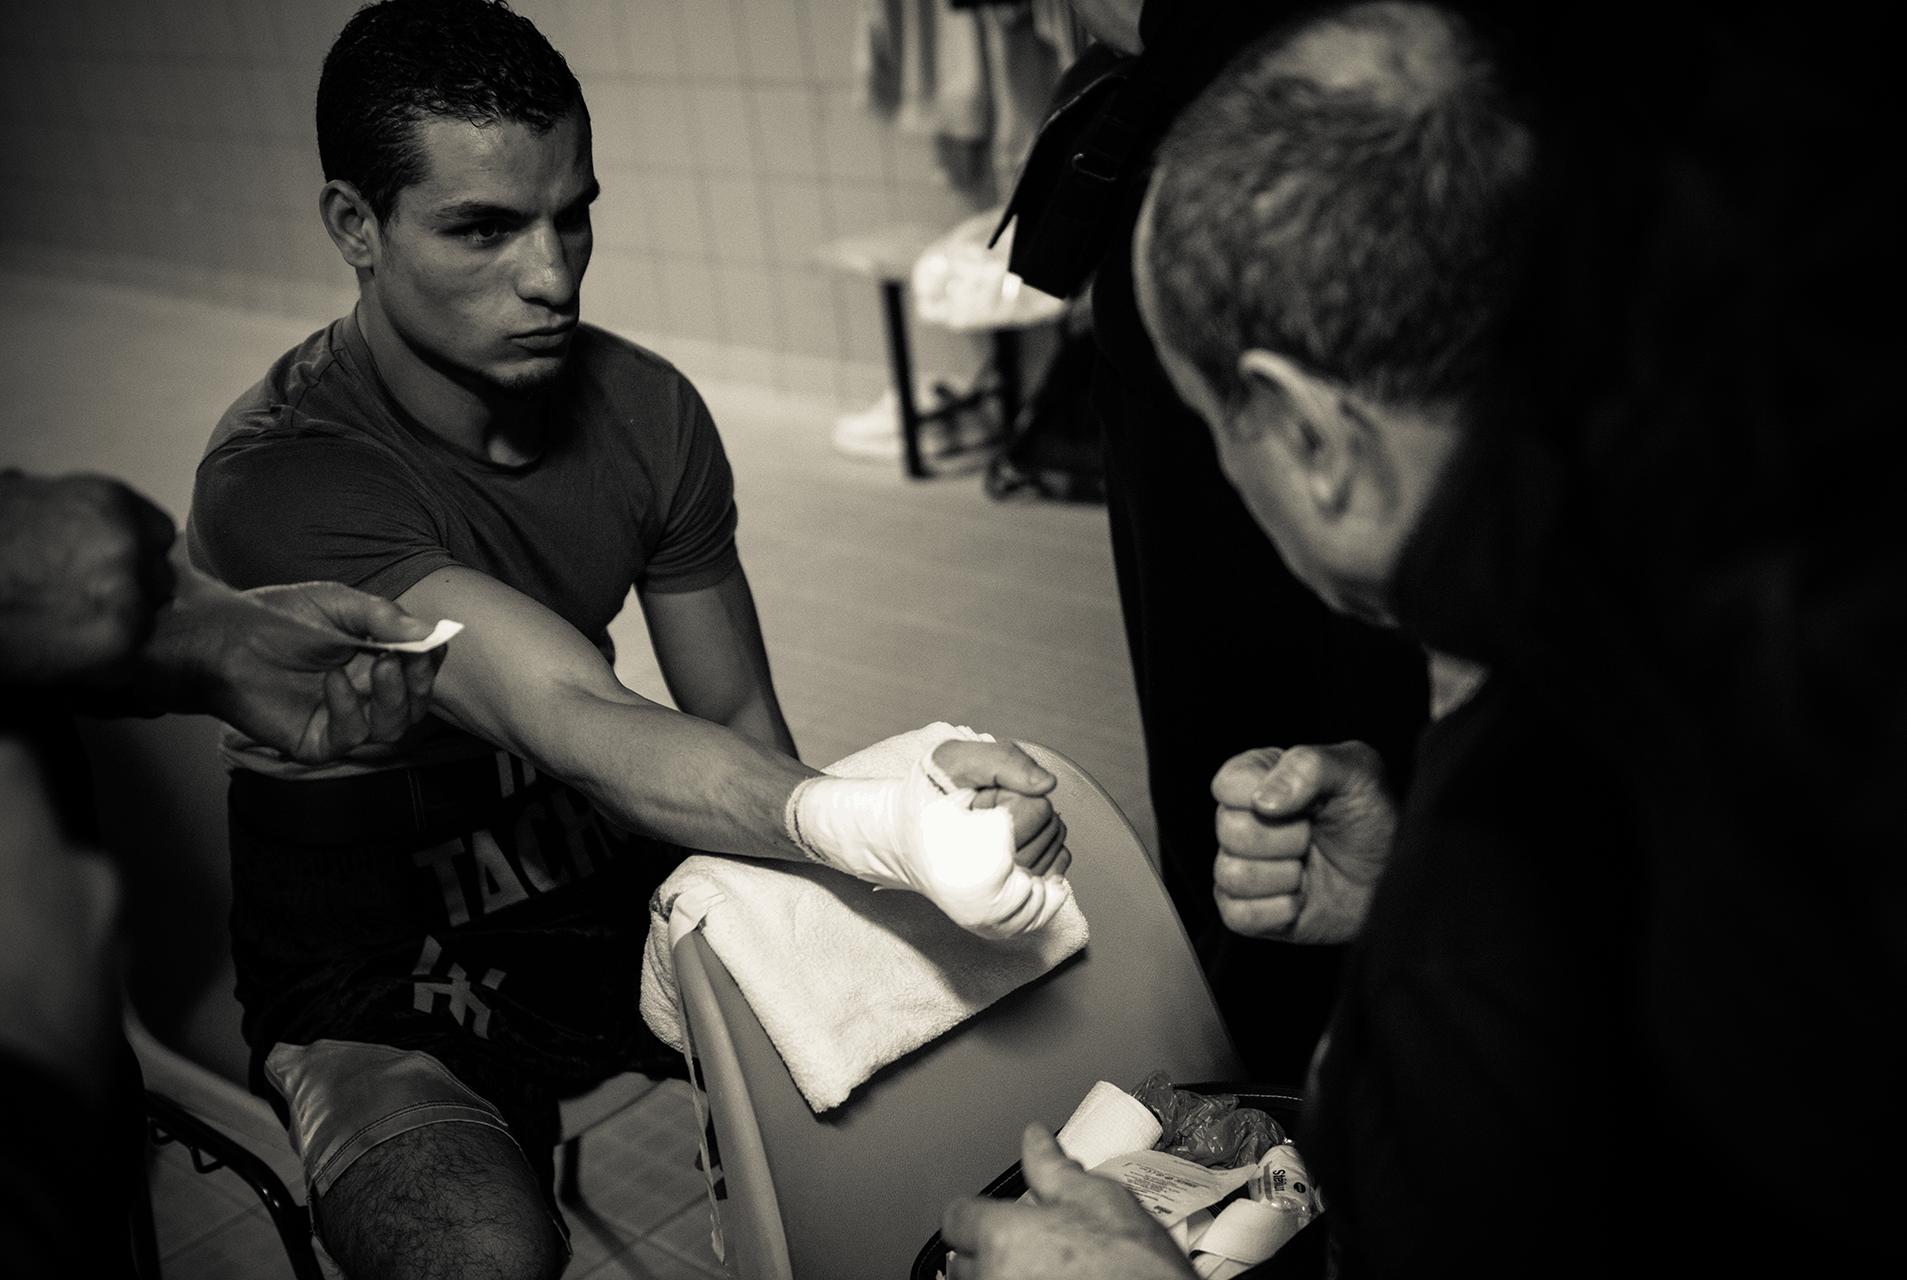 photographe-reportage-boxe-ile-de-france